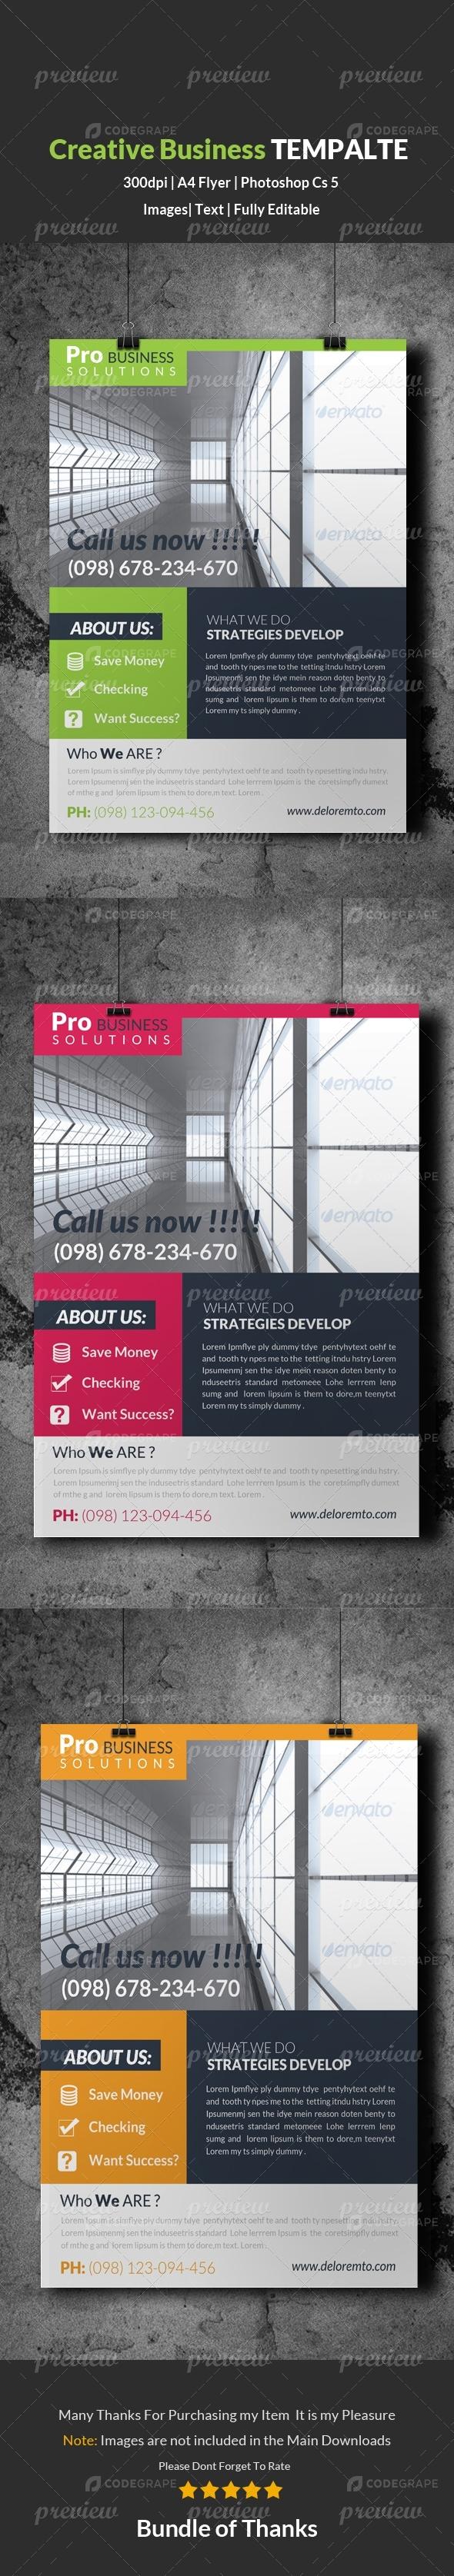 Creative Business Template